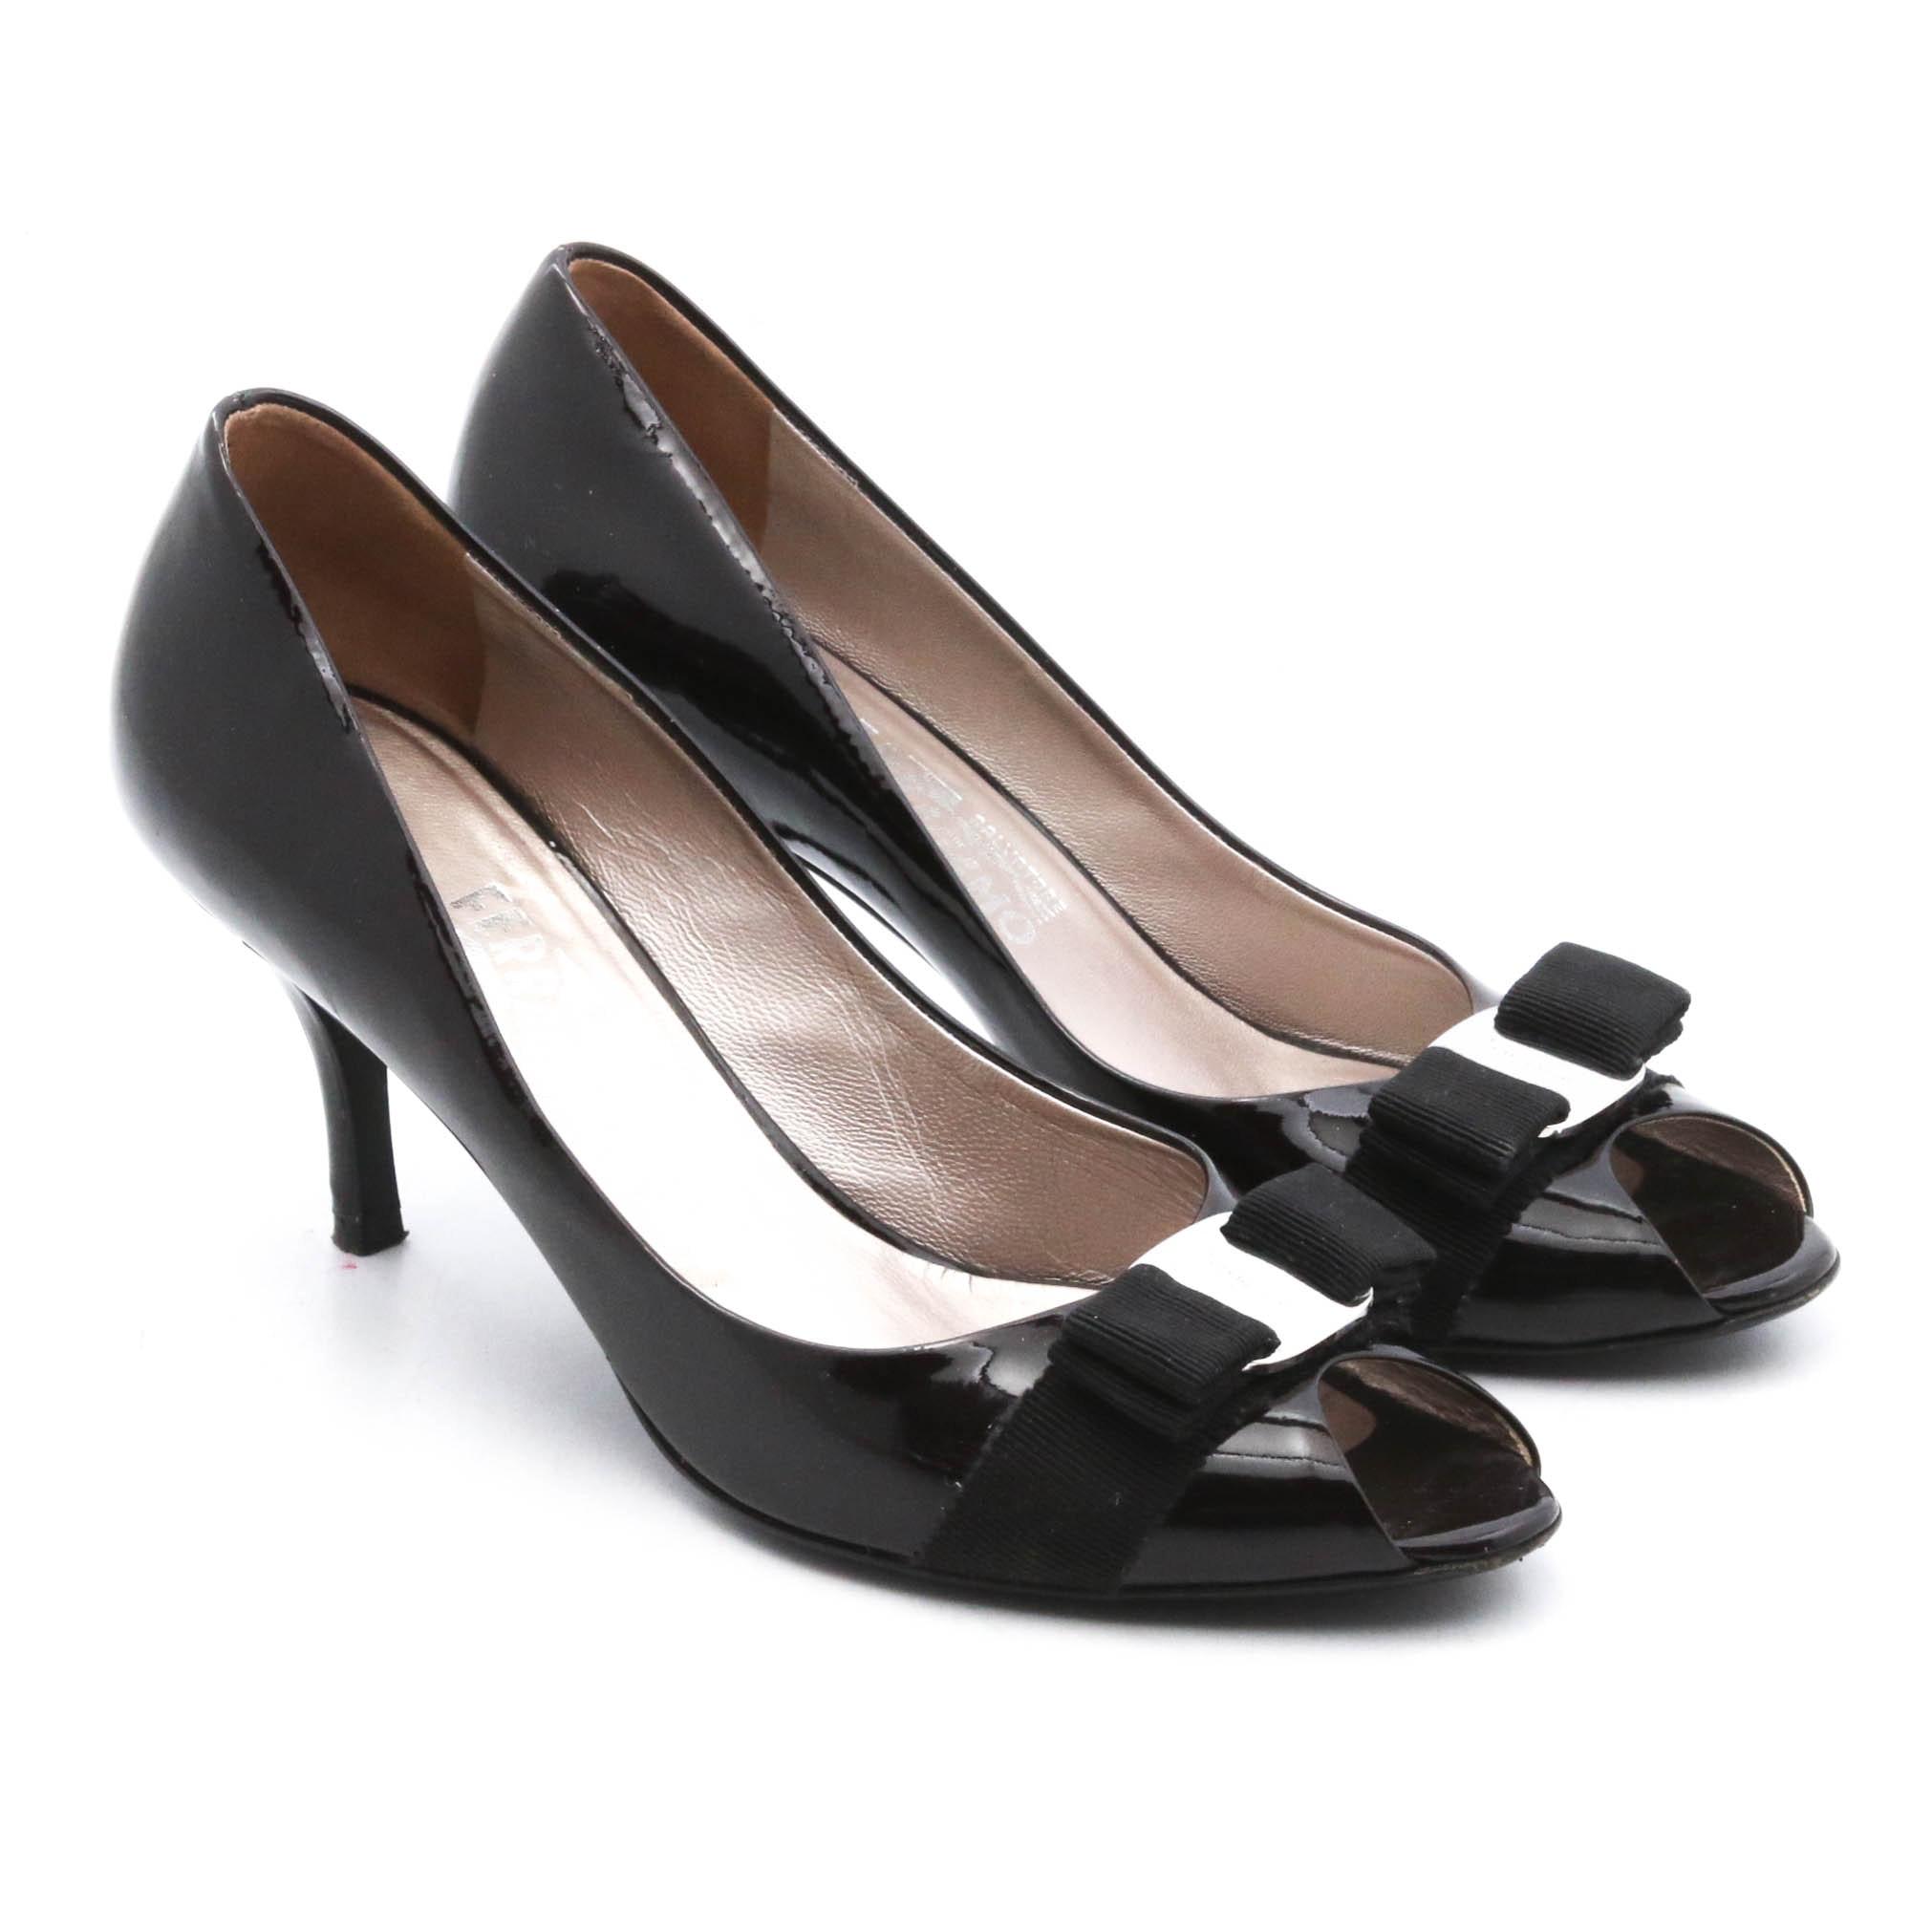 Salvatore Ferragamo Patent Leather Peep-Toe Stilettos, Made in Florence, Italy